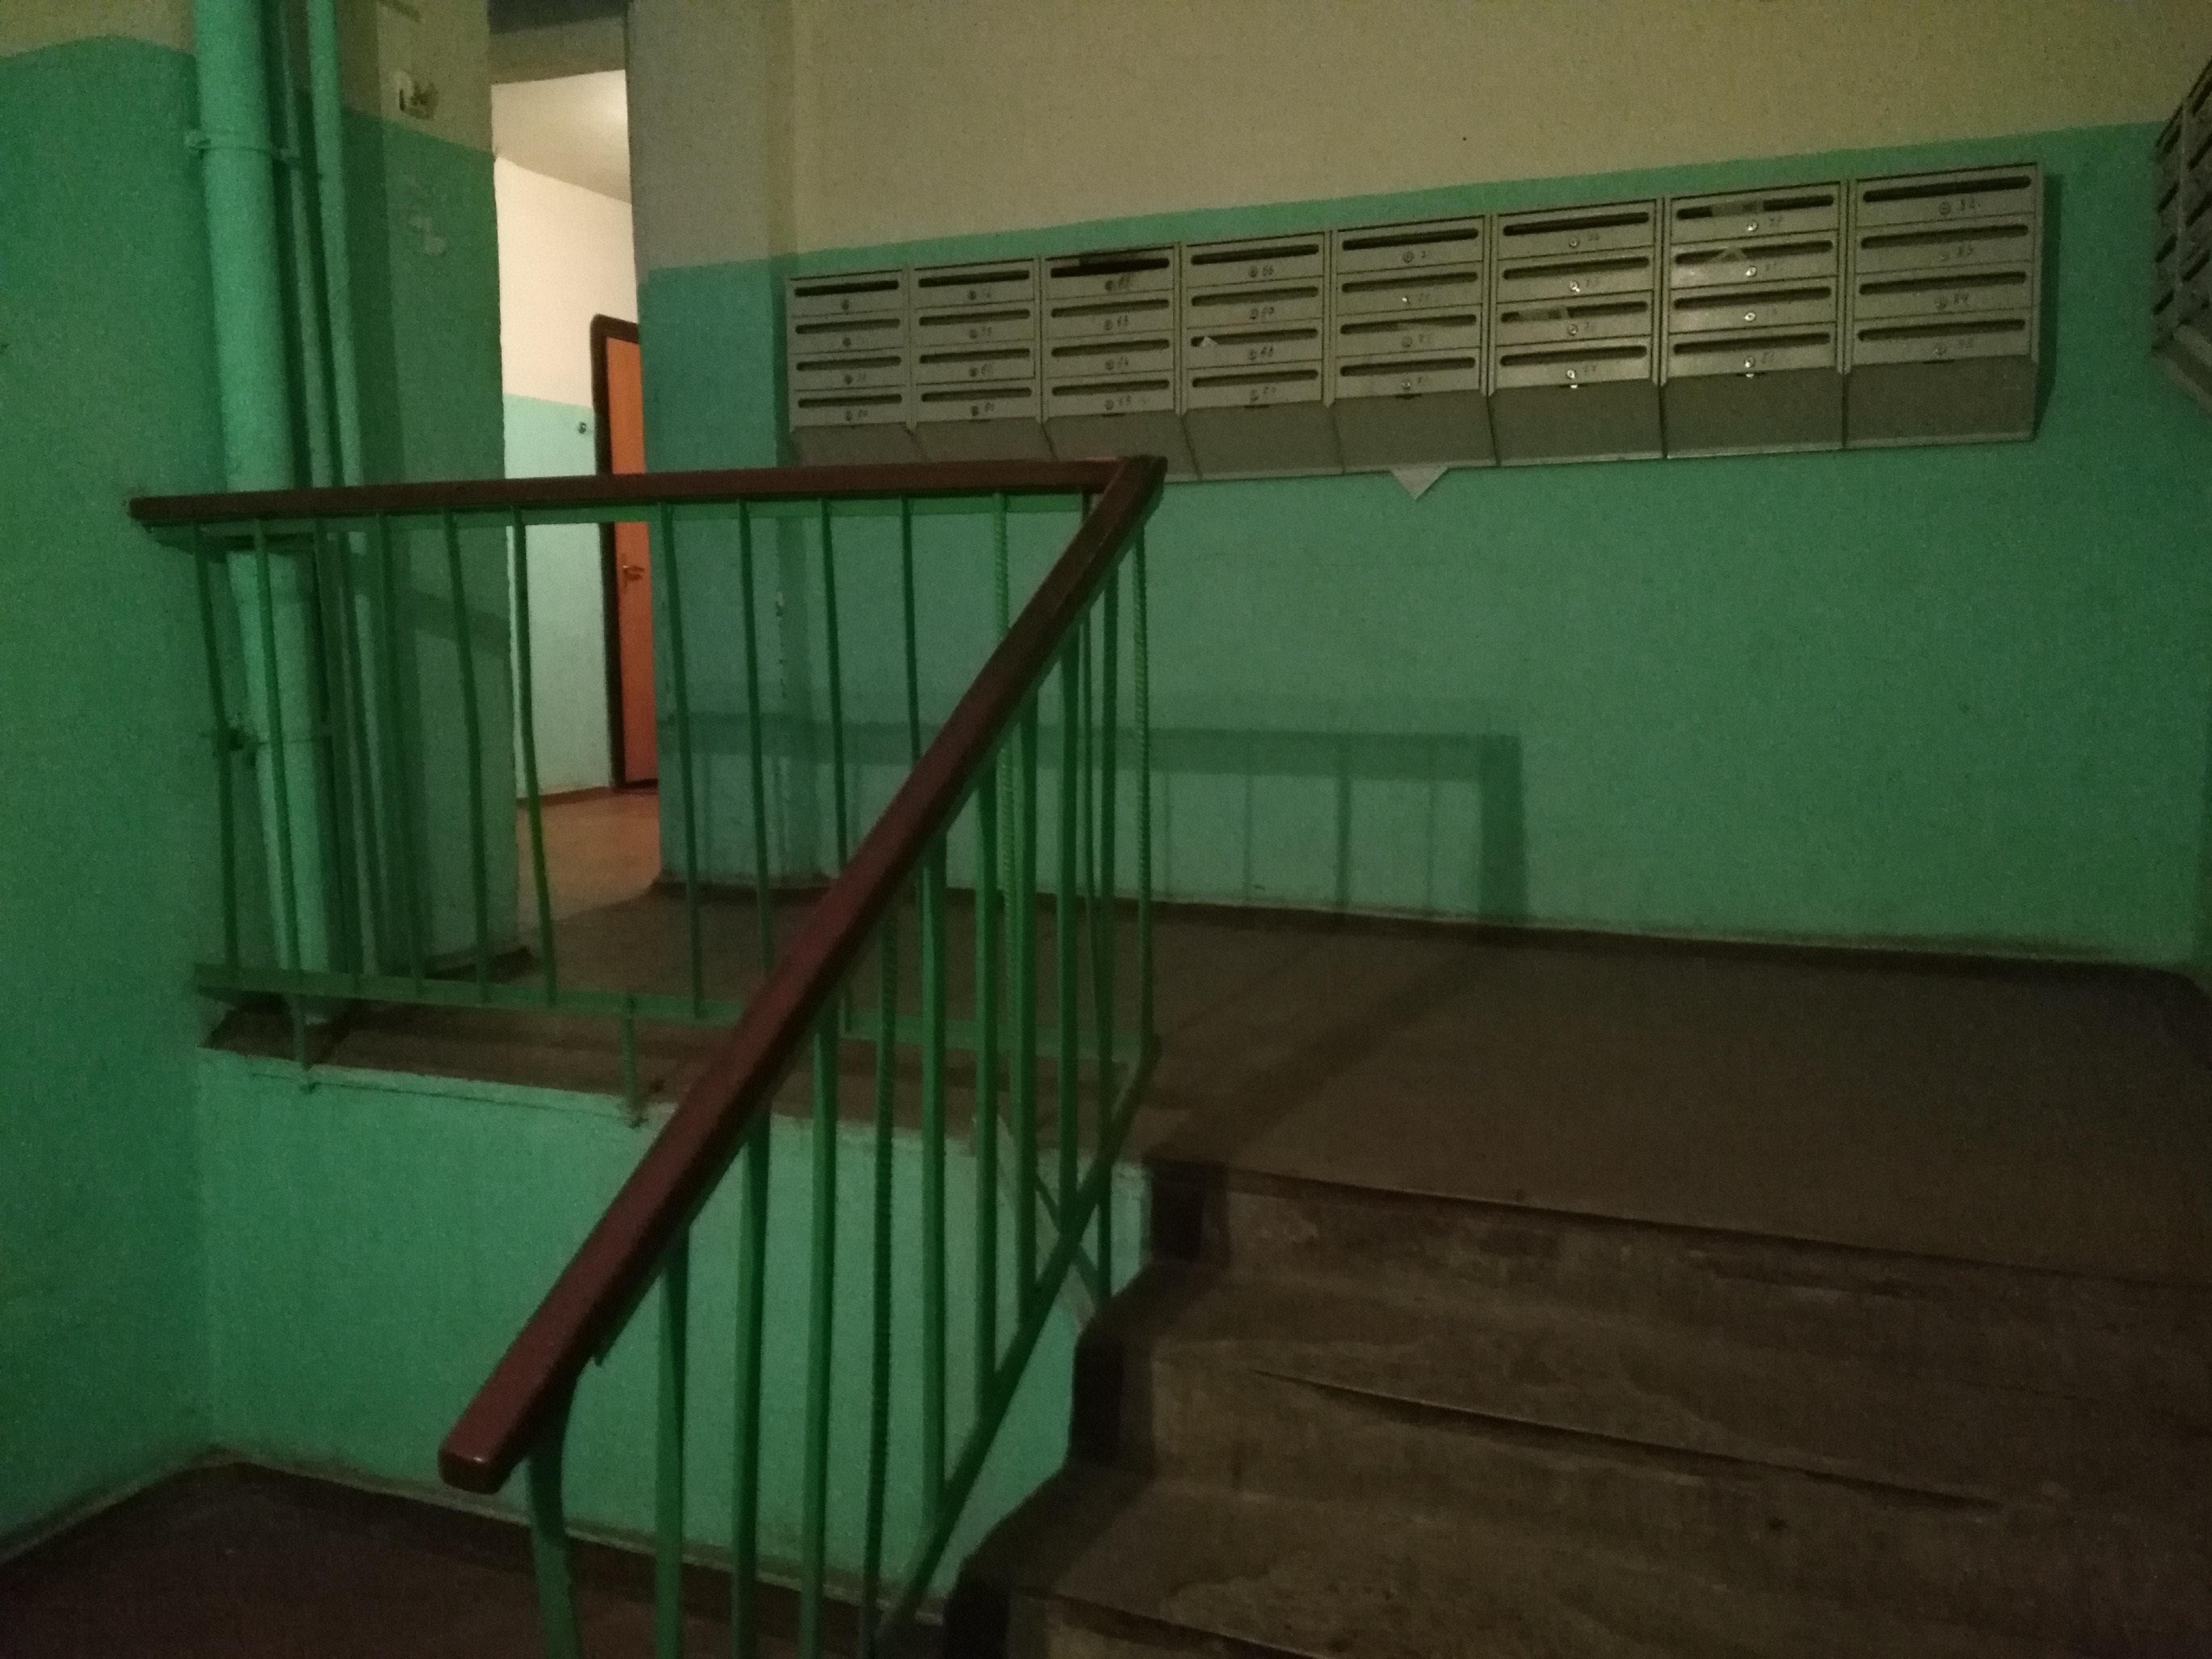 Однокомнатная квартира - ул. Юбилейная, д. 93